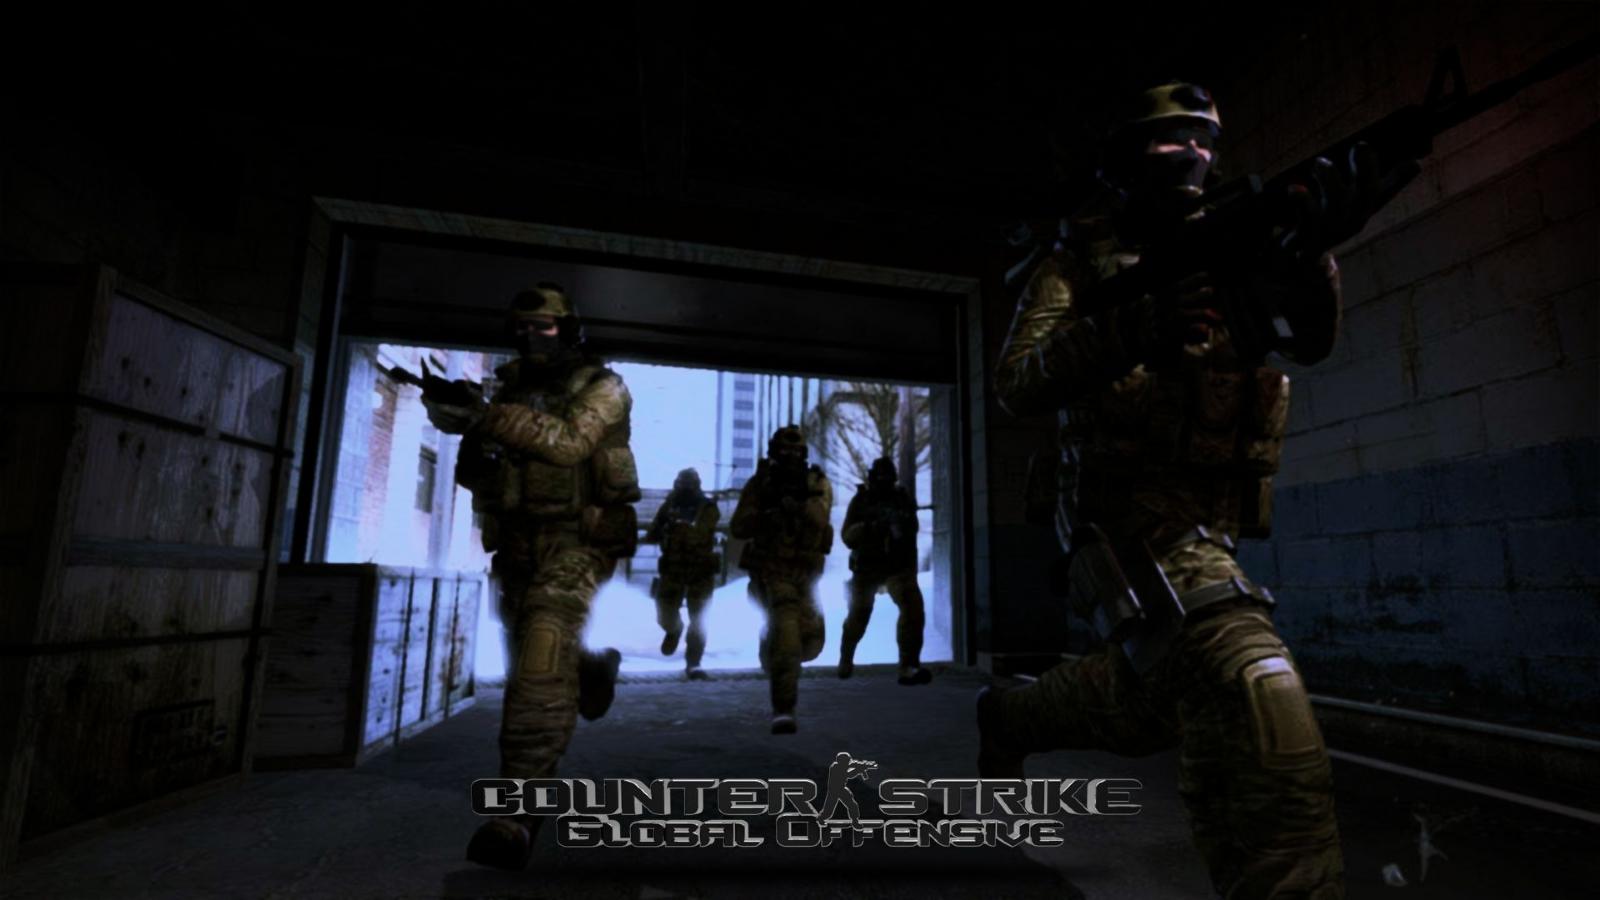 47] Counter Strike Global Offensive Wallpaper on WallpaperSafari 1600x900